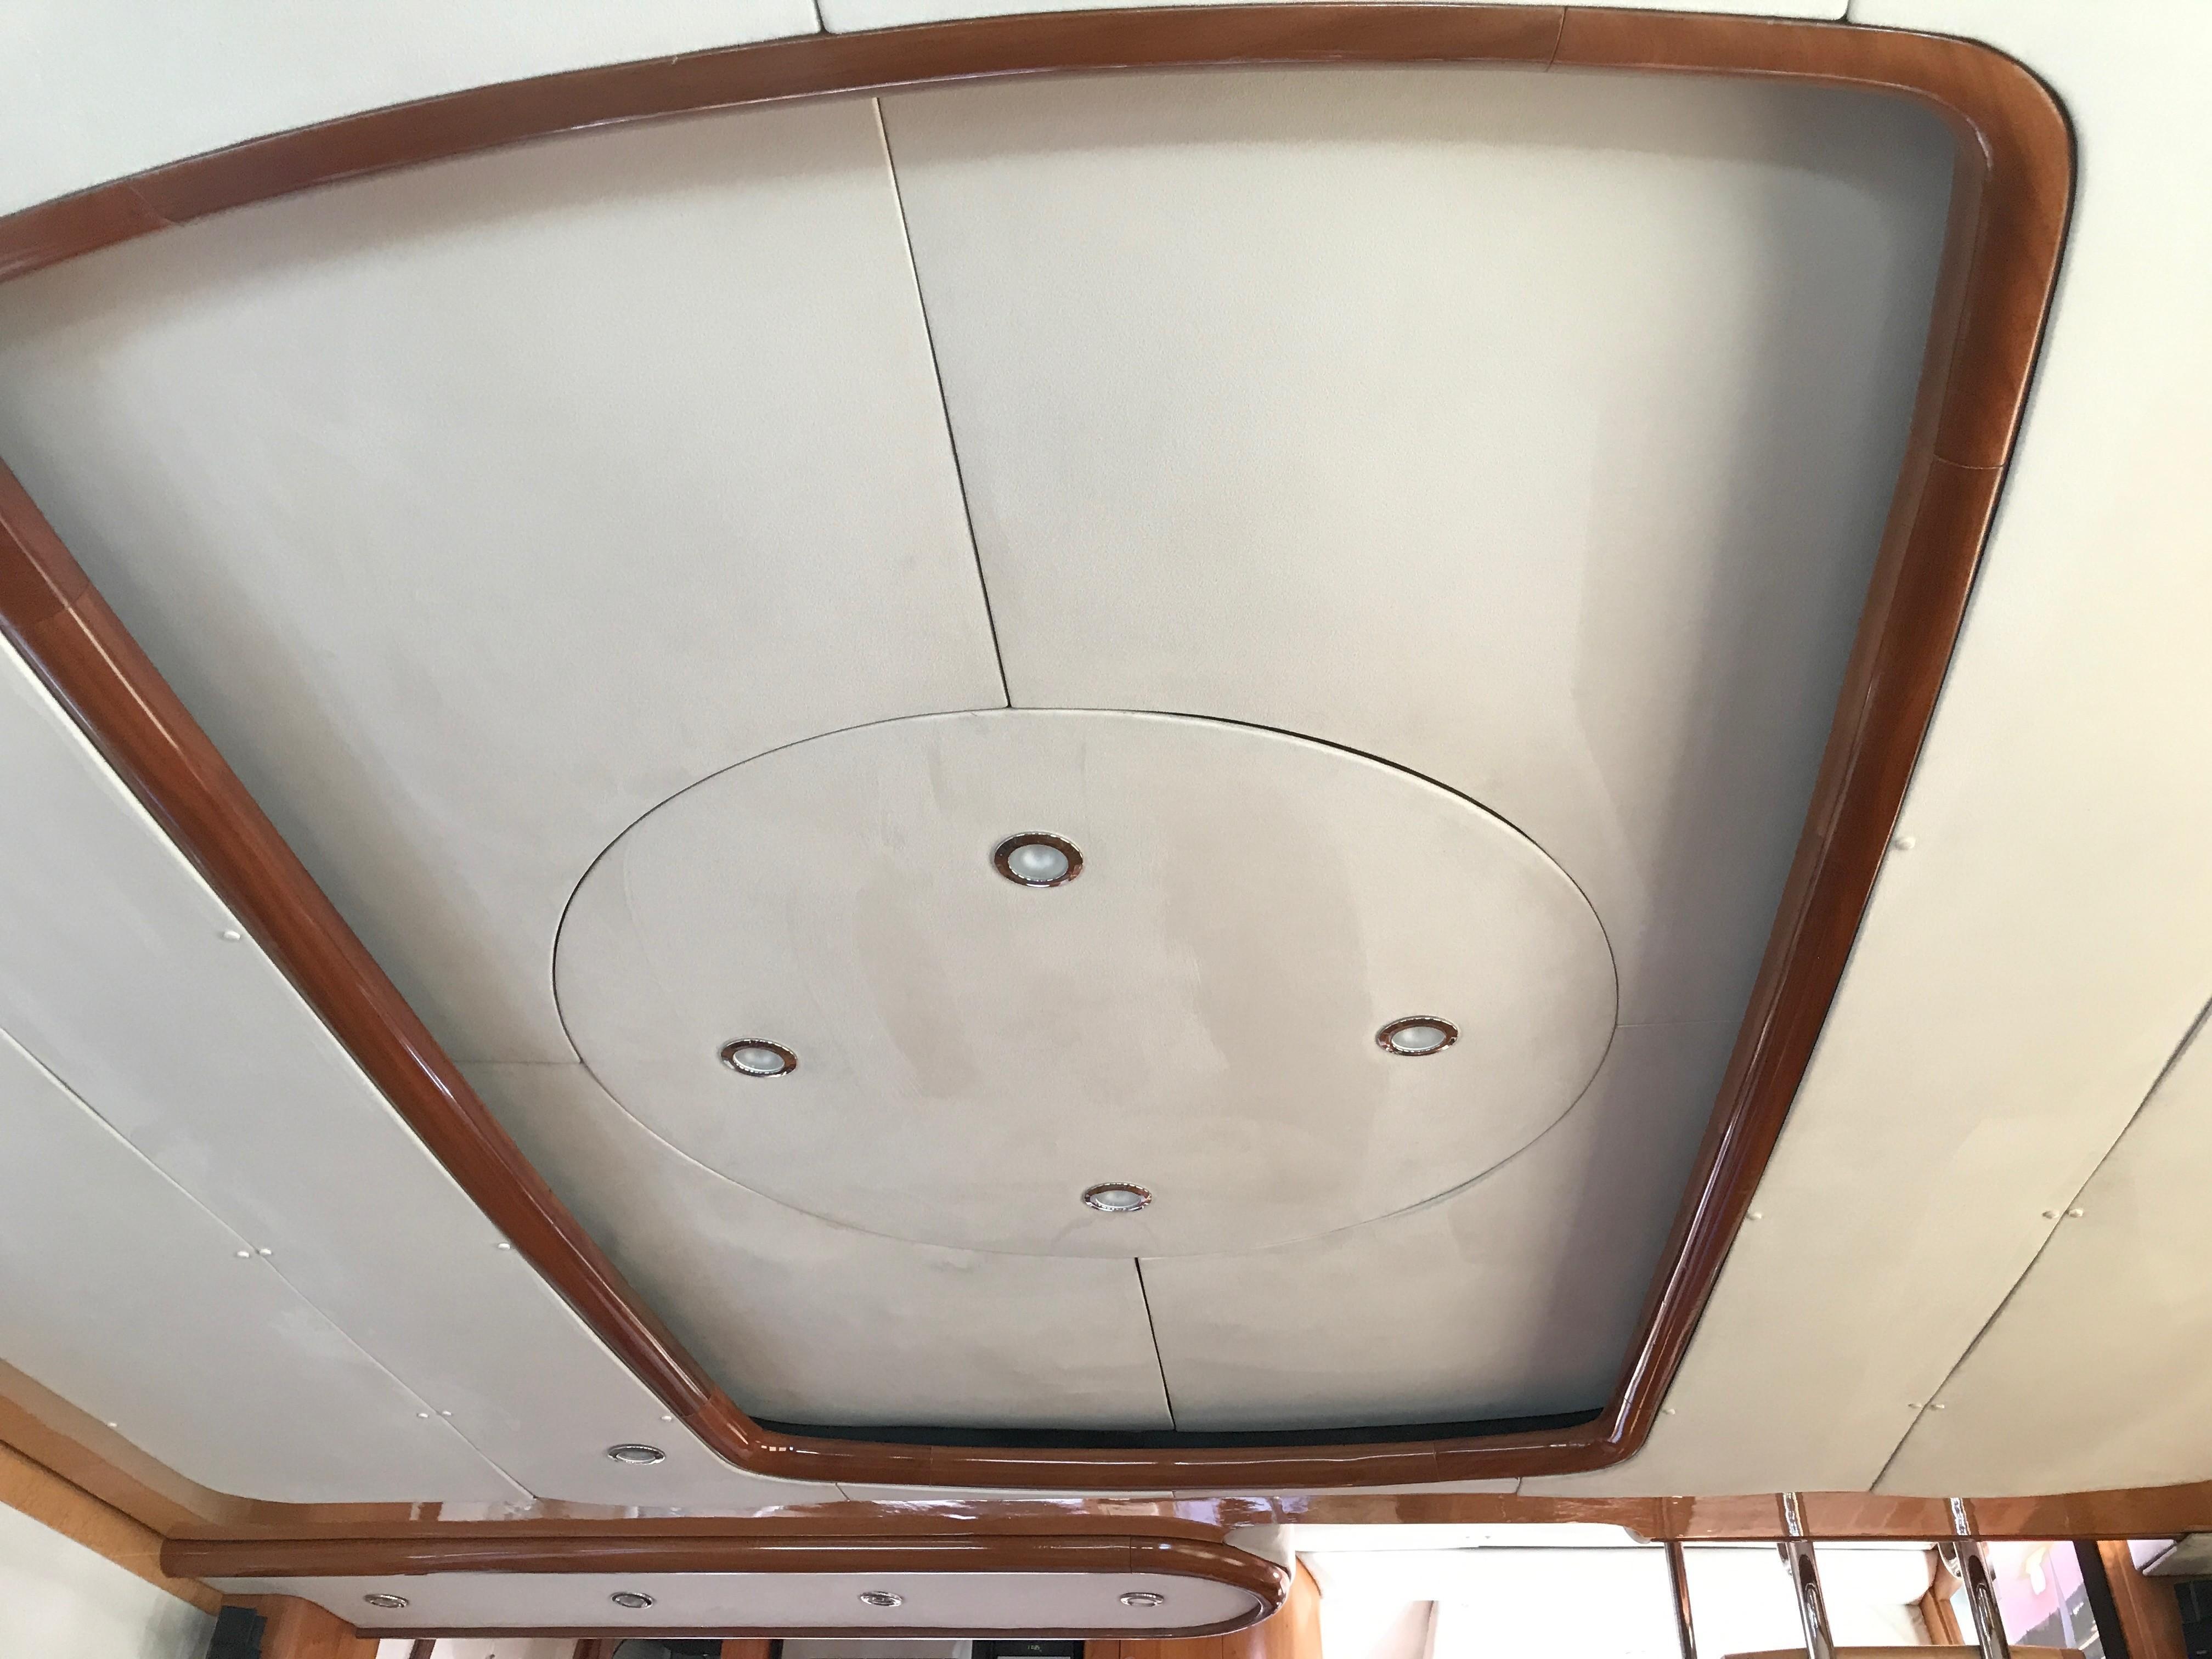 Salon overhead